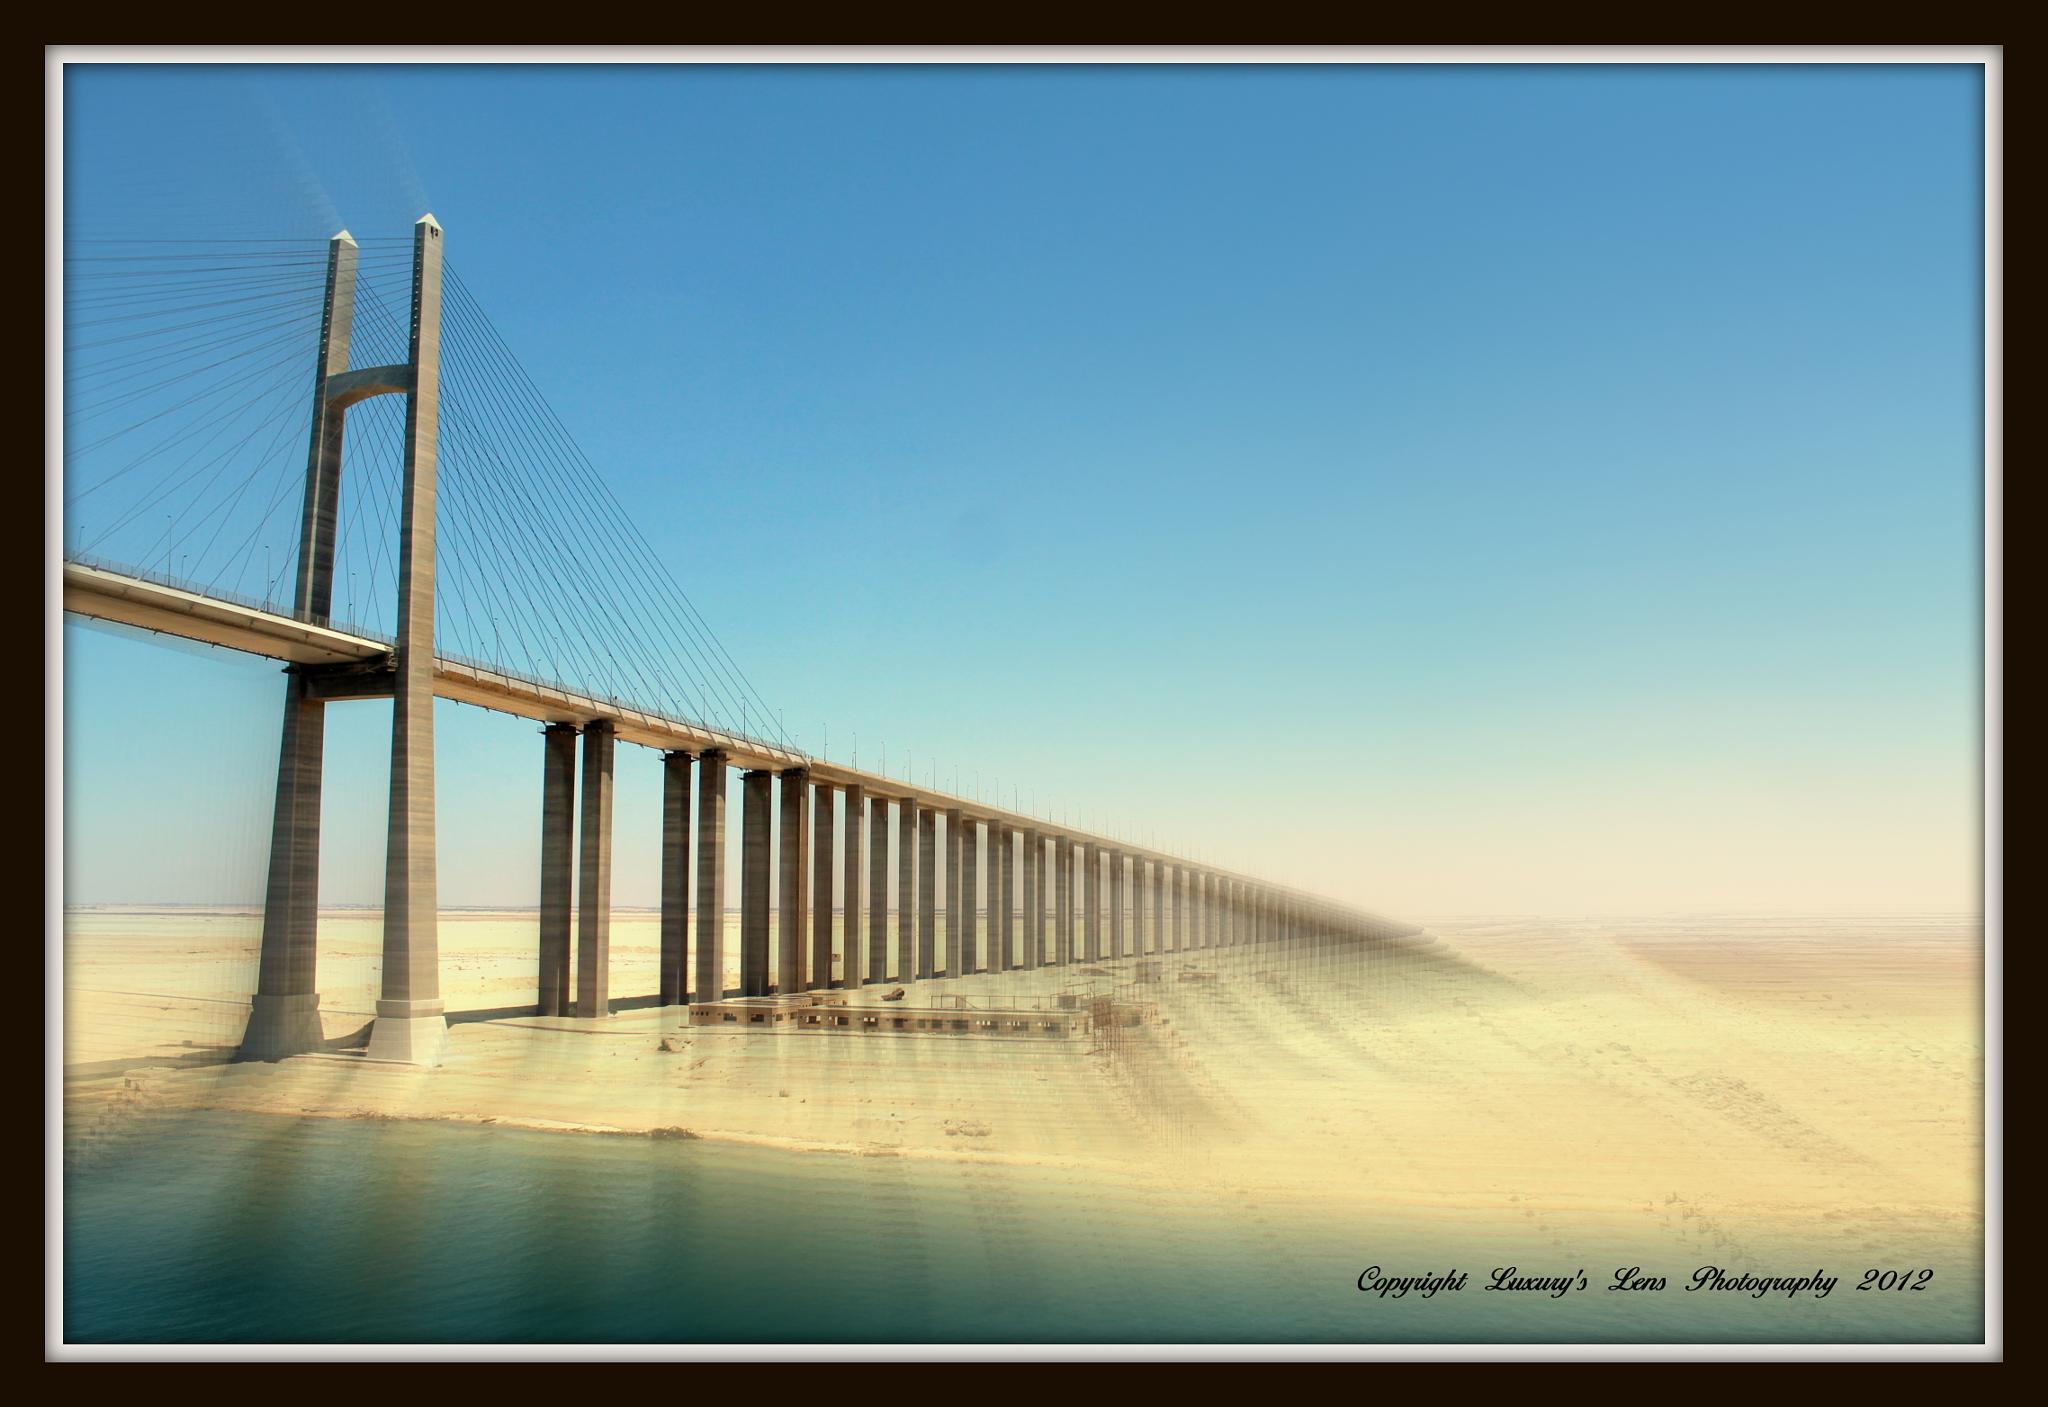 Friendship Bridge by ChristopherMorrison